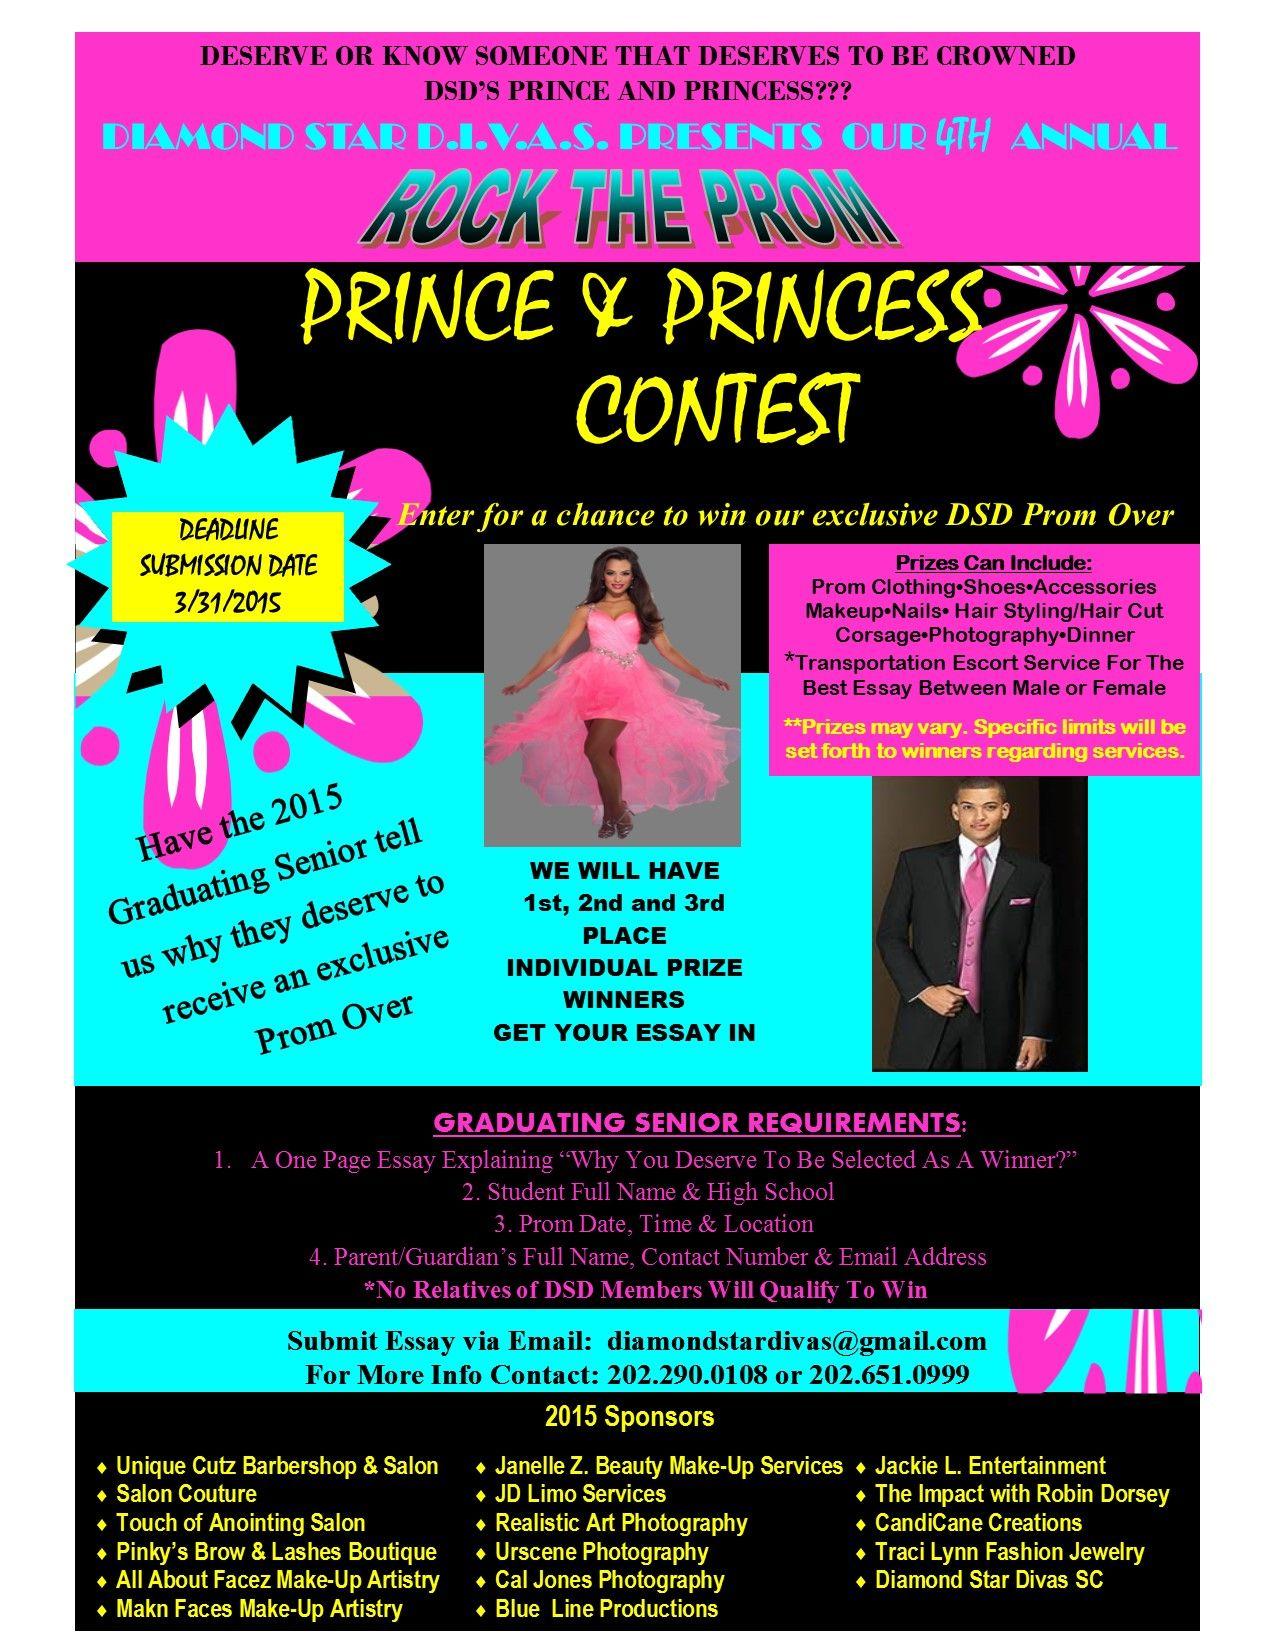 Diamond Star Diva Sc 4th Rock The Prom Prince Princes Contest For Graduating H S Senior Within Dmv Metro And Pocking Essay